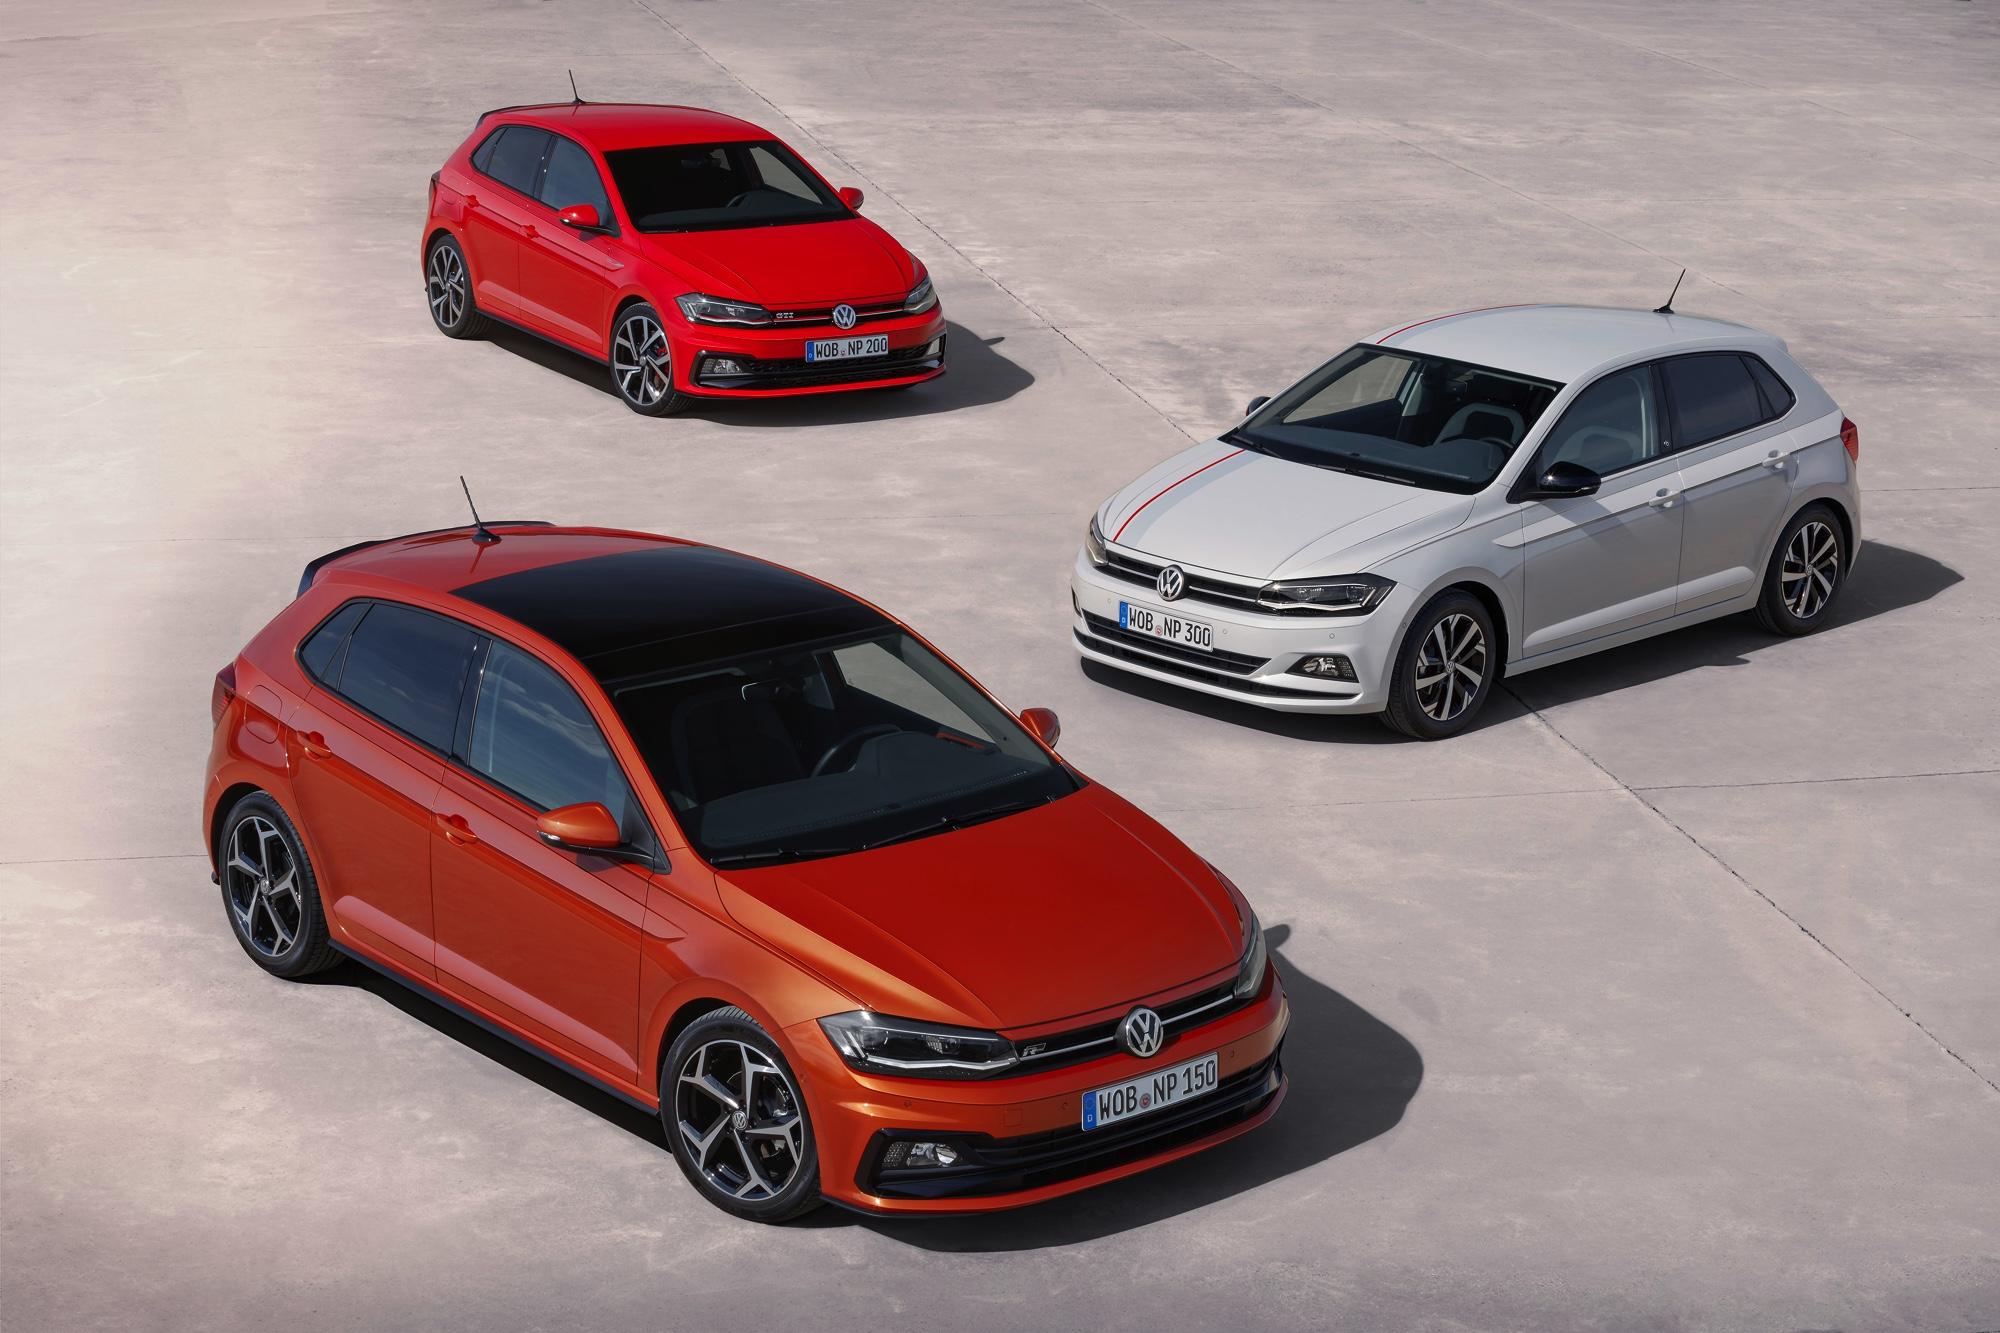 Volkswagen Polo family 2017 - Autovisie.nl